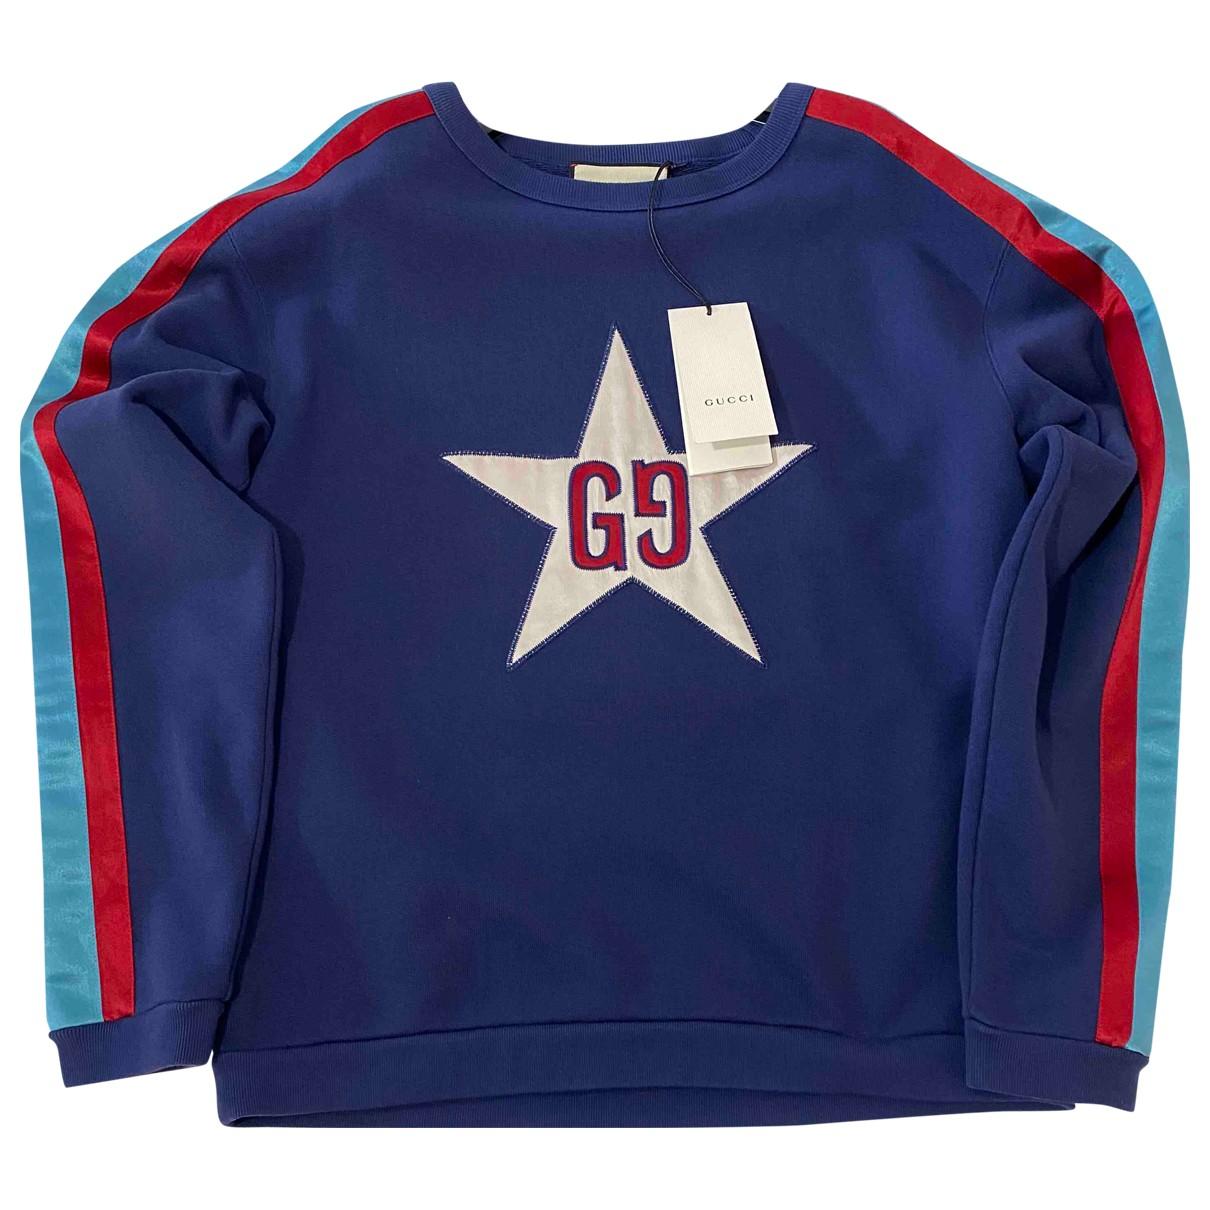 Gucci N Blue Cotton Knitwear & Sweatshirts for Men XS International